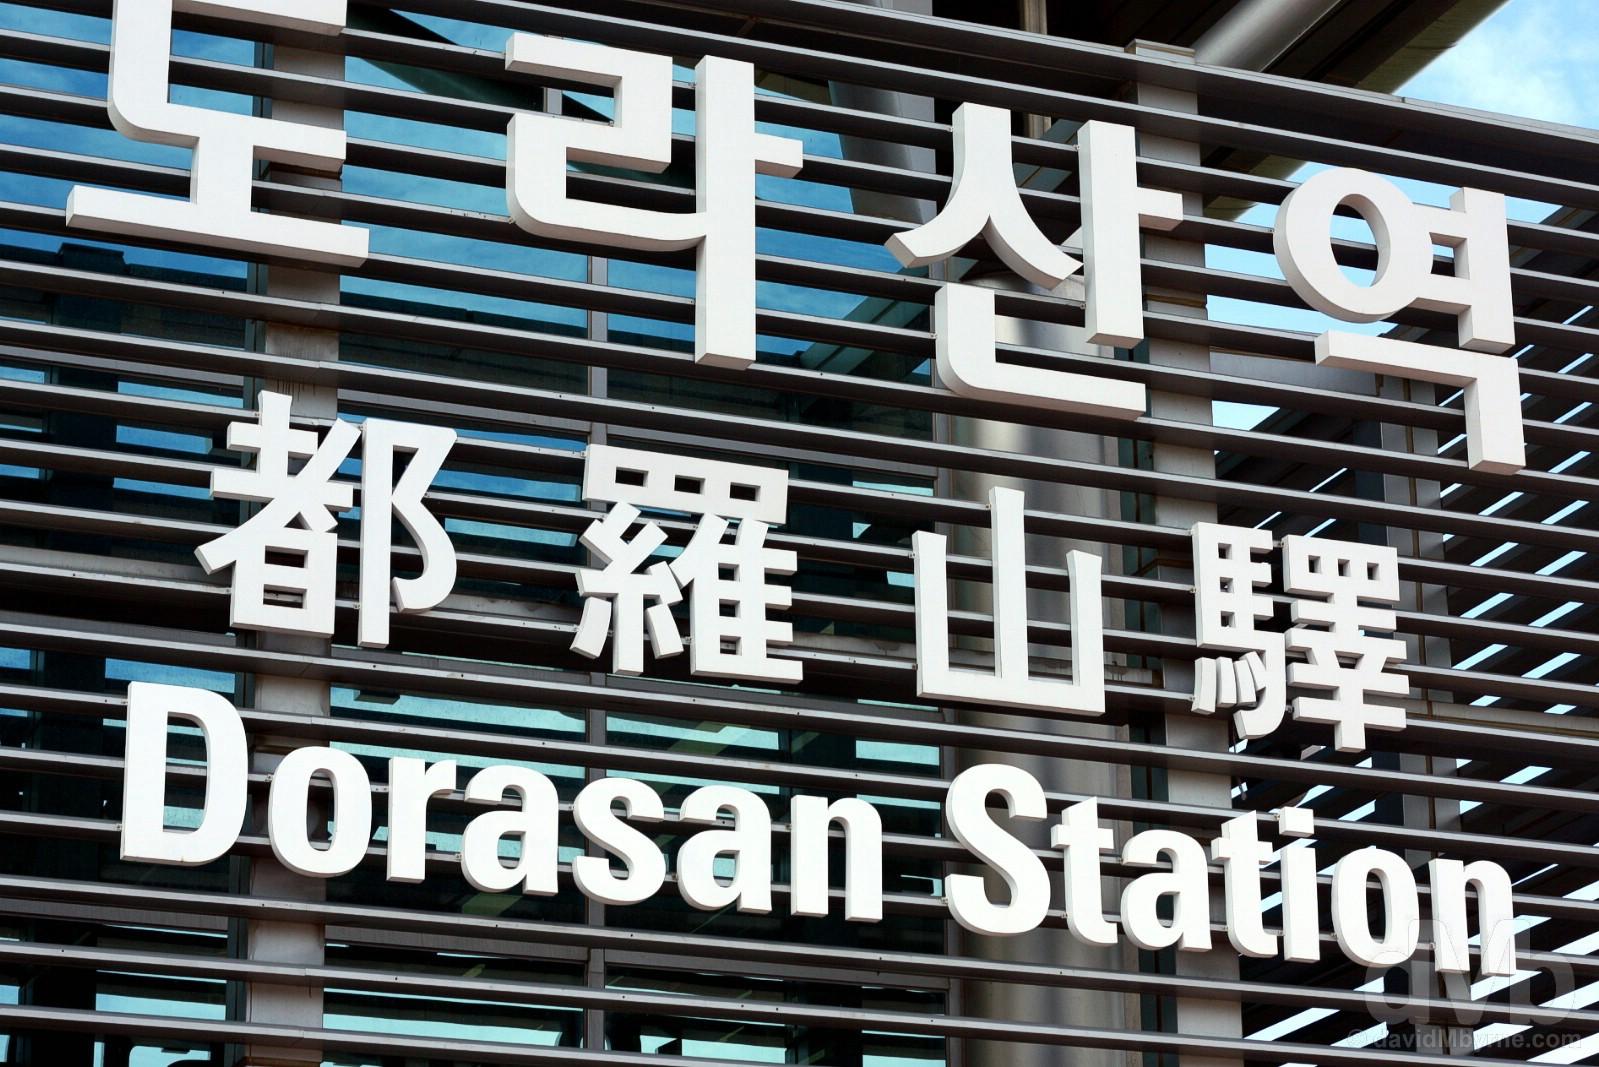 Dorasan Station, South Korea. August 21, 2009.